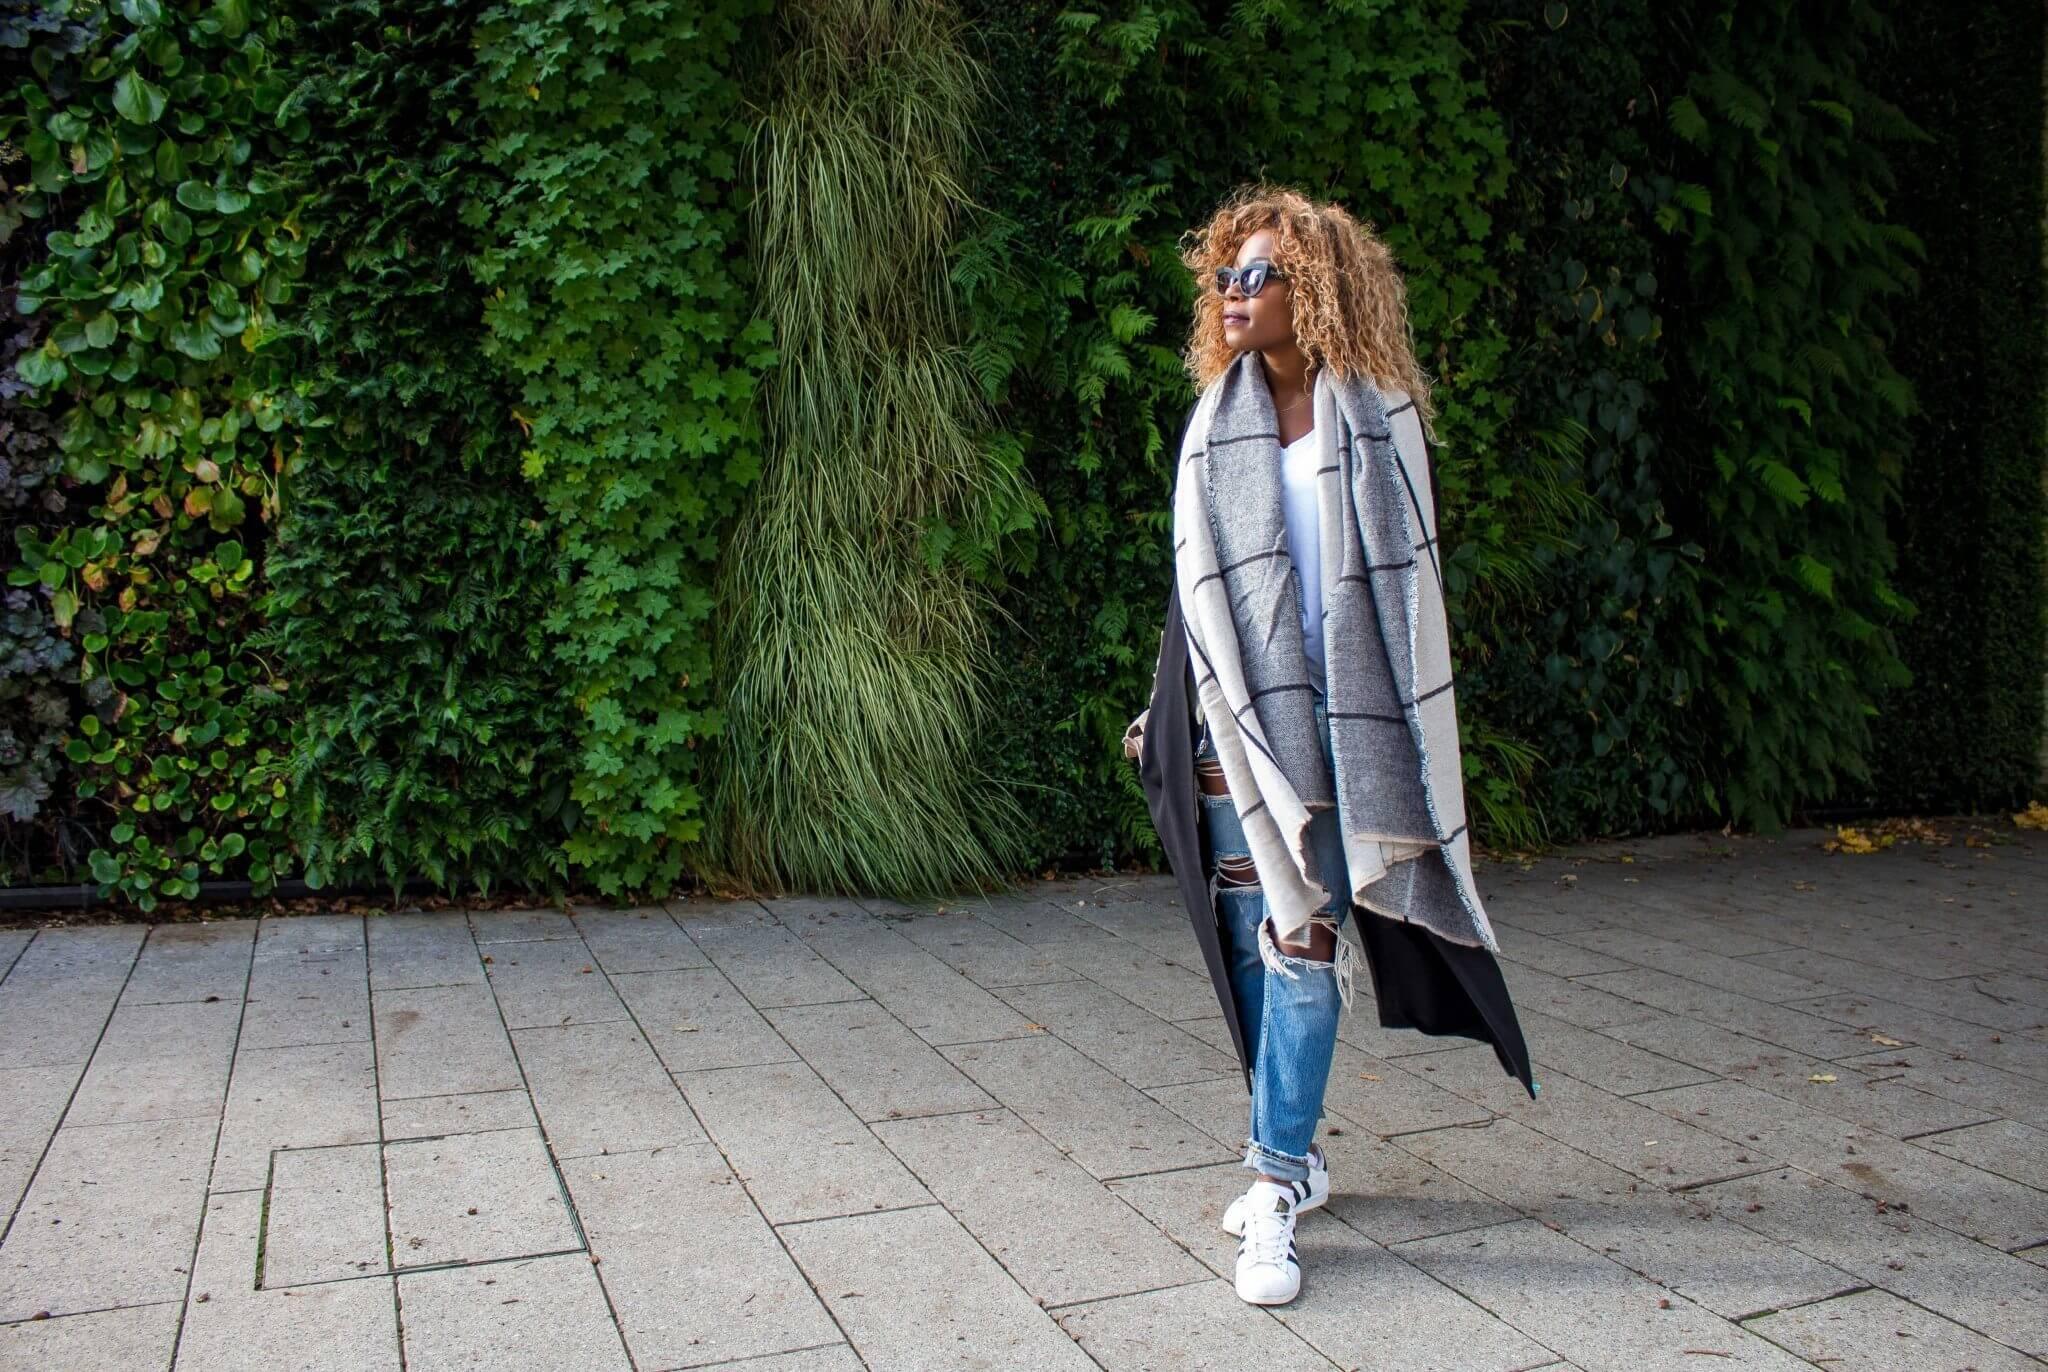 zara-scarves-schal-asos-duster-adidas-superstars-blogparade-2